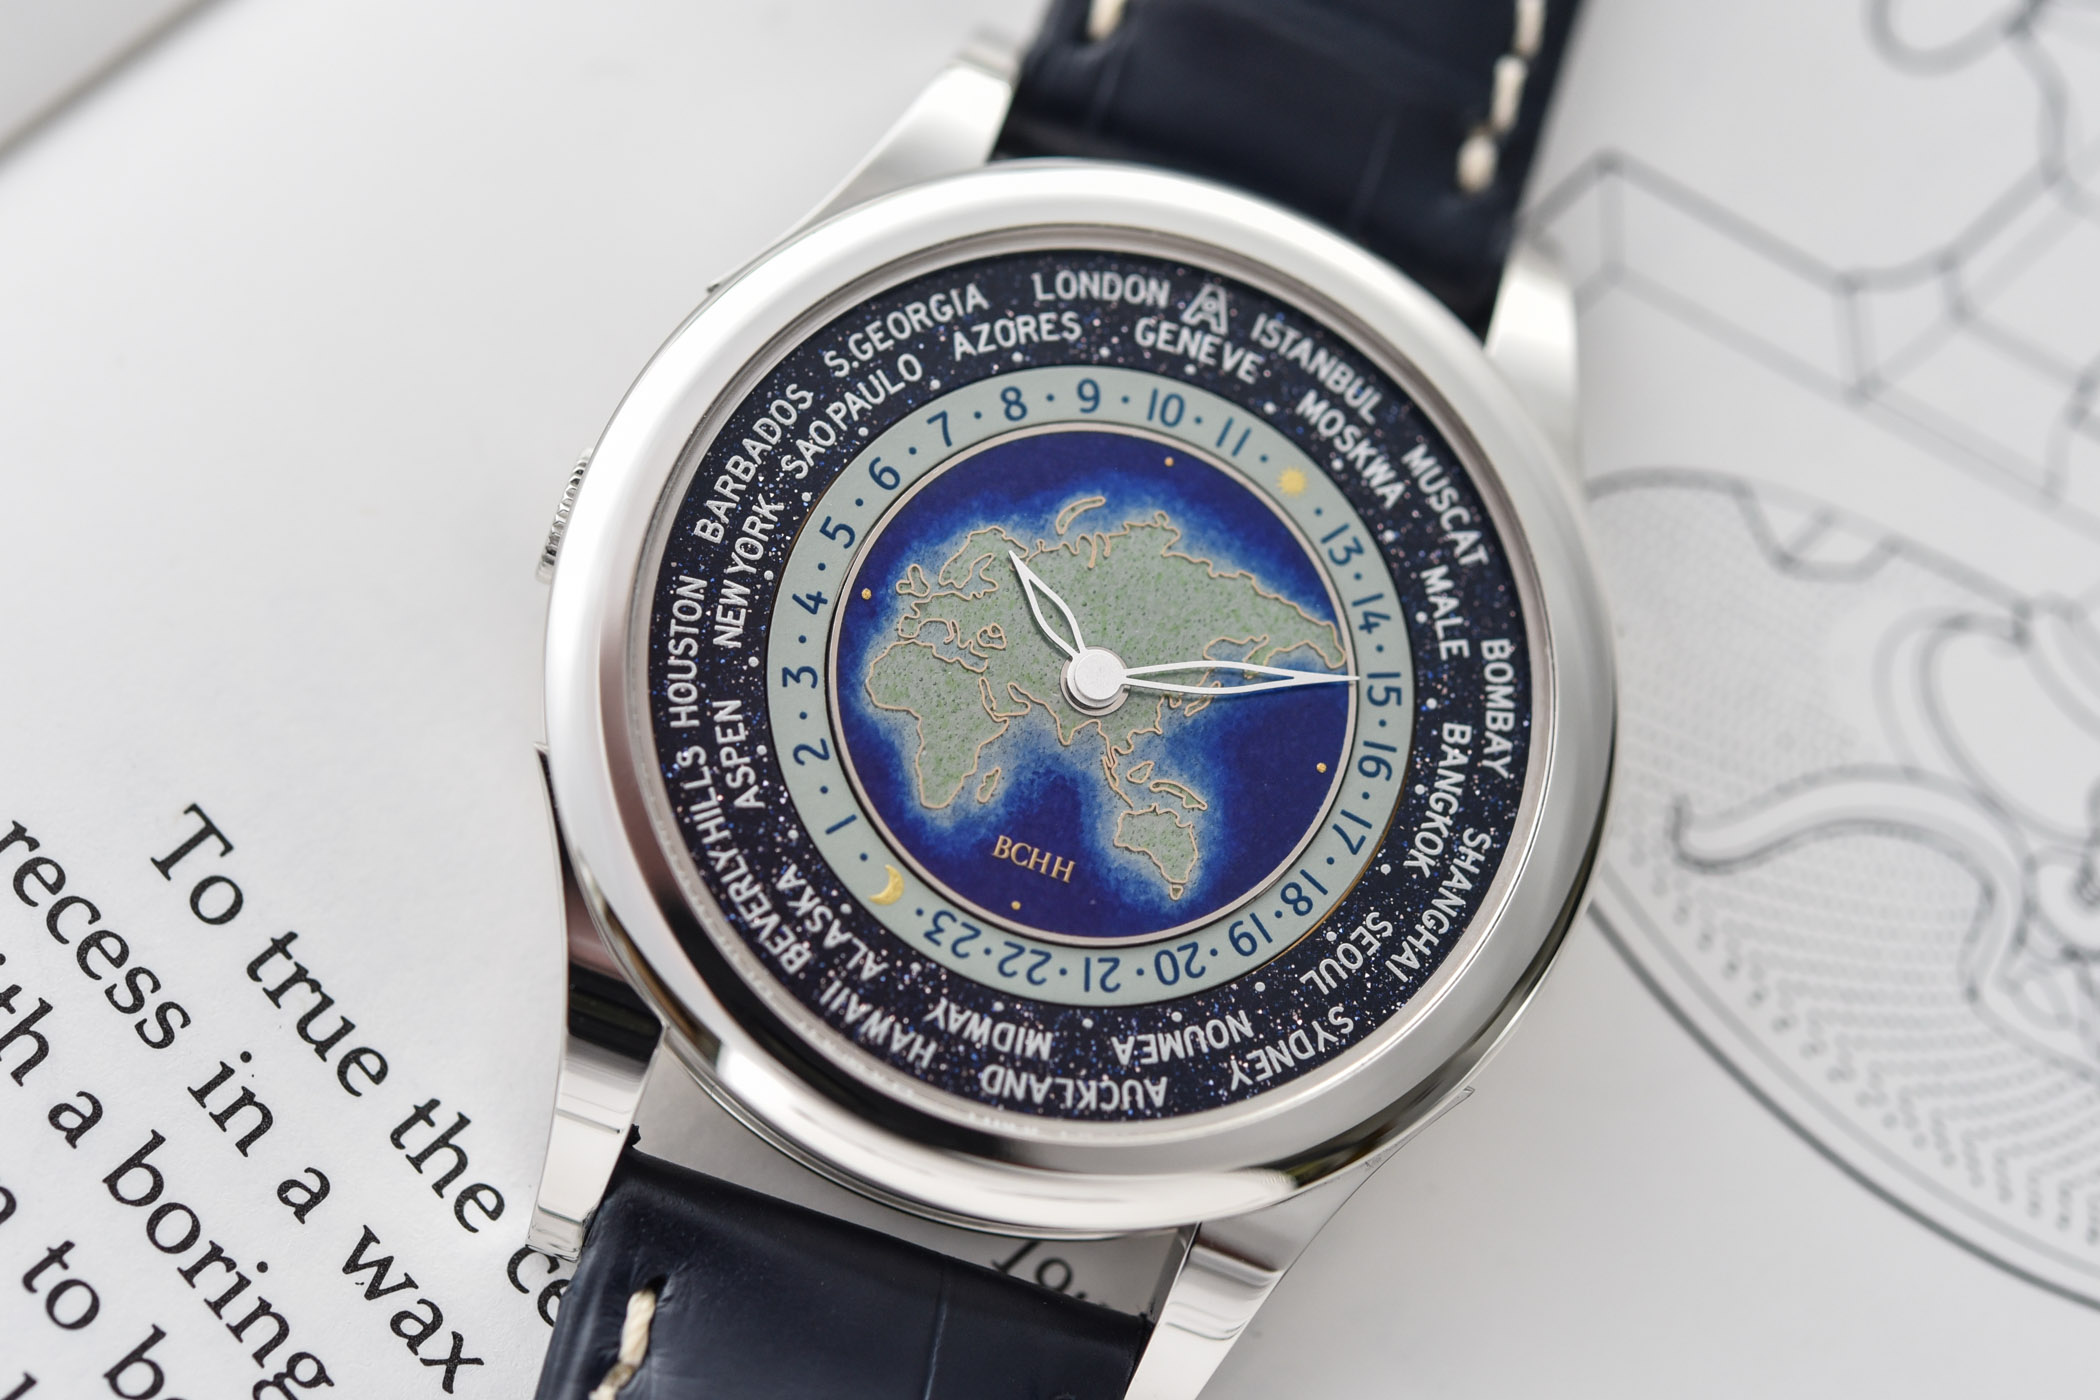 BCHH Celestial Voyager World Timer Cloisonne Enamel Andersen Geneve - 12